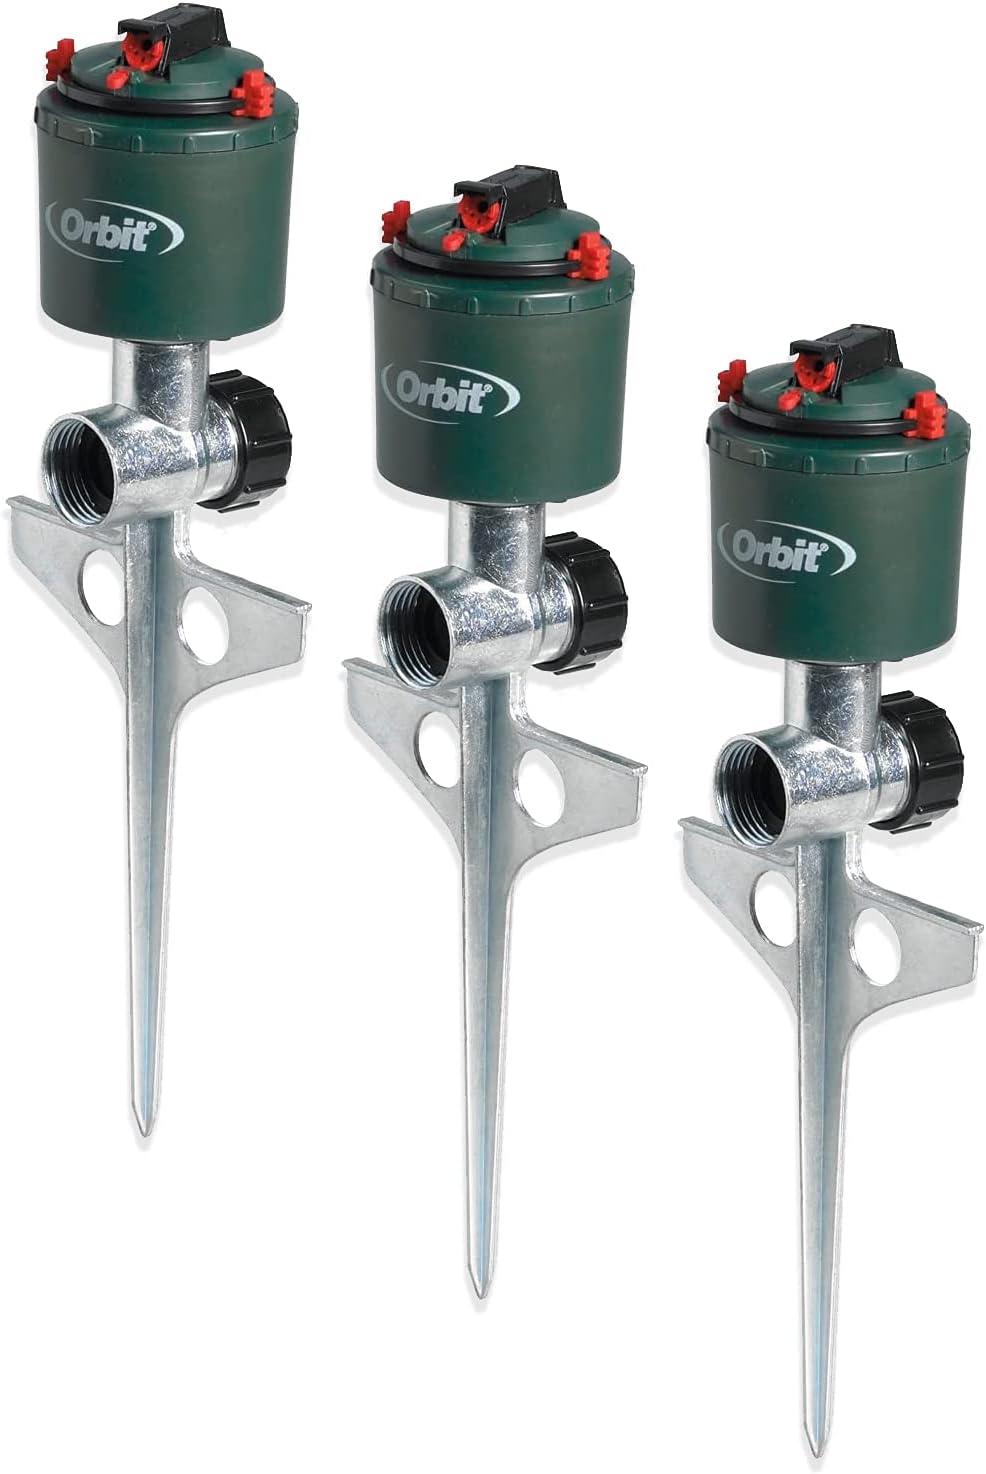 毎日続々入荷 Orbit 3 Pack Compact Gear Driven Sprinkler on Sturdy Spike 直送商品 Lawn